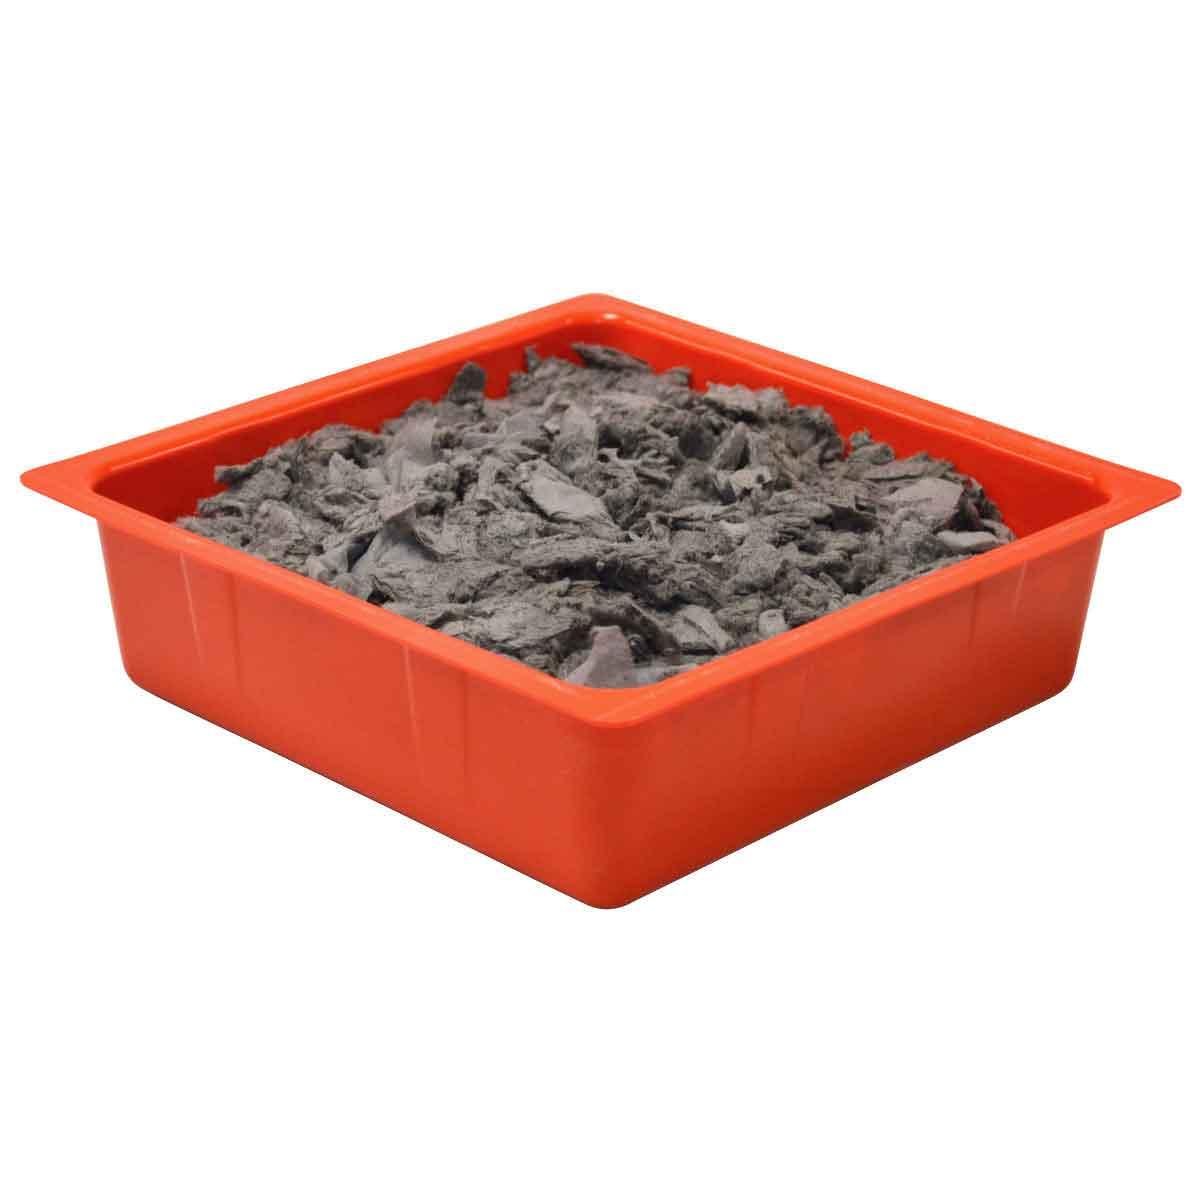 SPC® ALLWIK® DPA24 Drip Pan With 10 x 10 in Pillow, 10-1/2 in L x 10-1/2 in W x 3 in H, High Density Polypropylene, Orange, 0.75 gal Spill